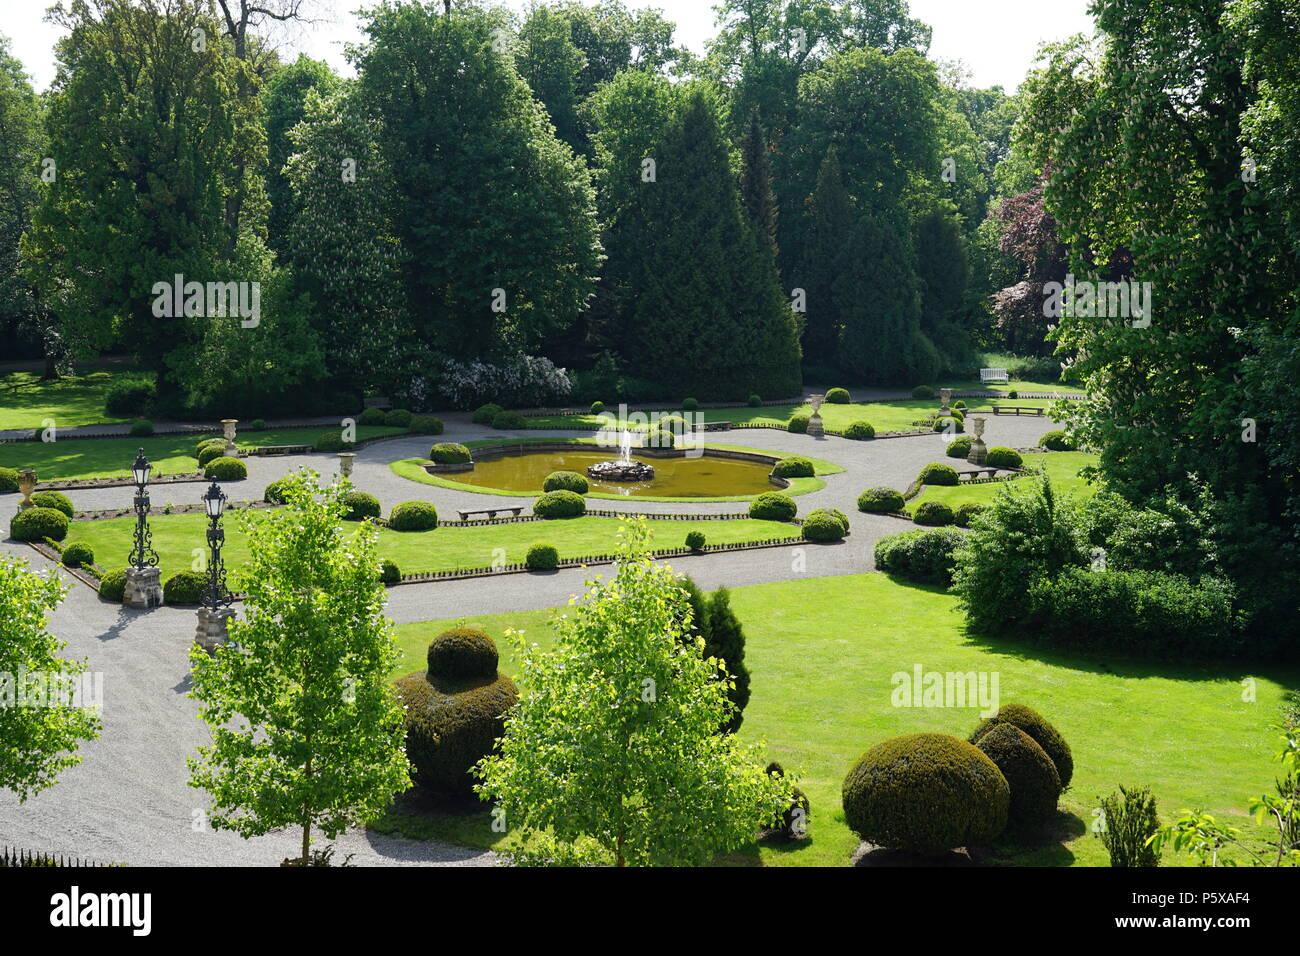 Schloßpark Donaueschingen, Baden-Württemberg, Germany, Europe - Stock Image